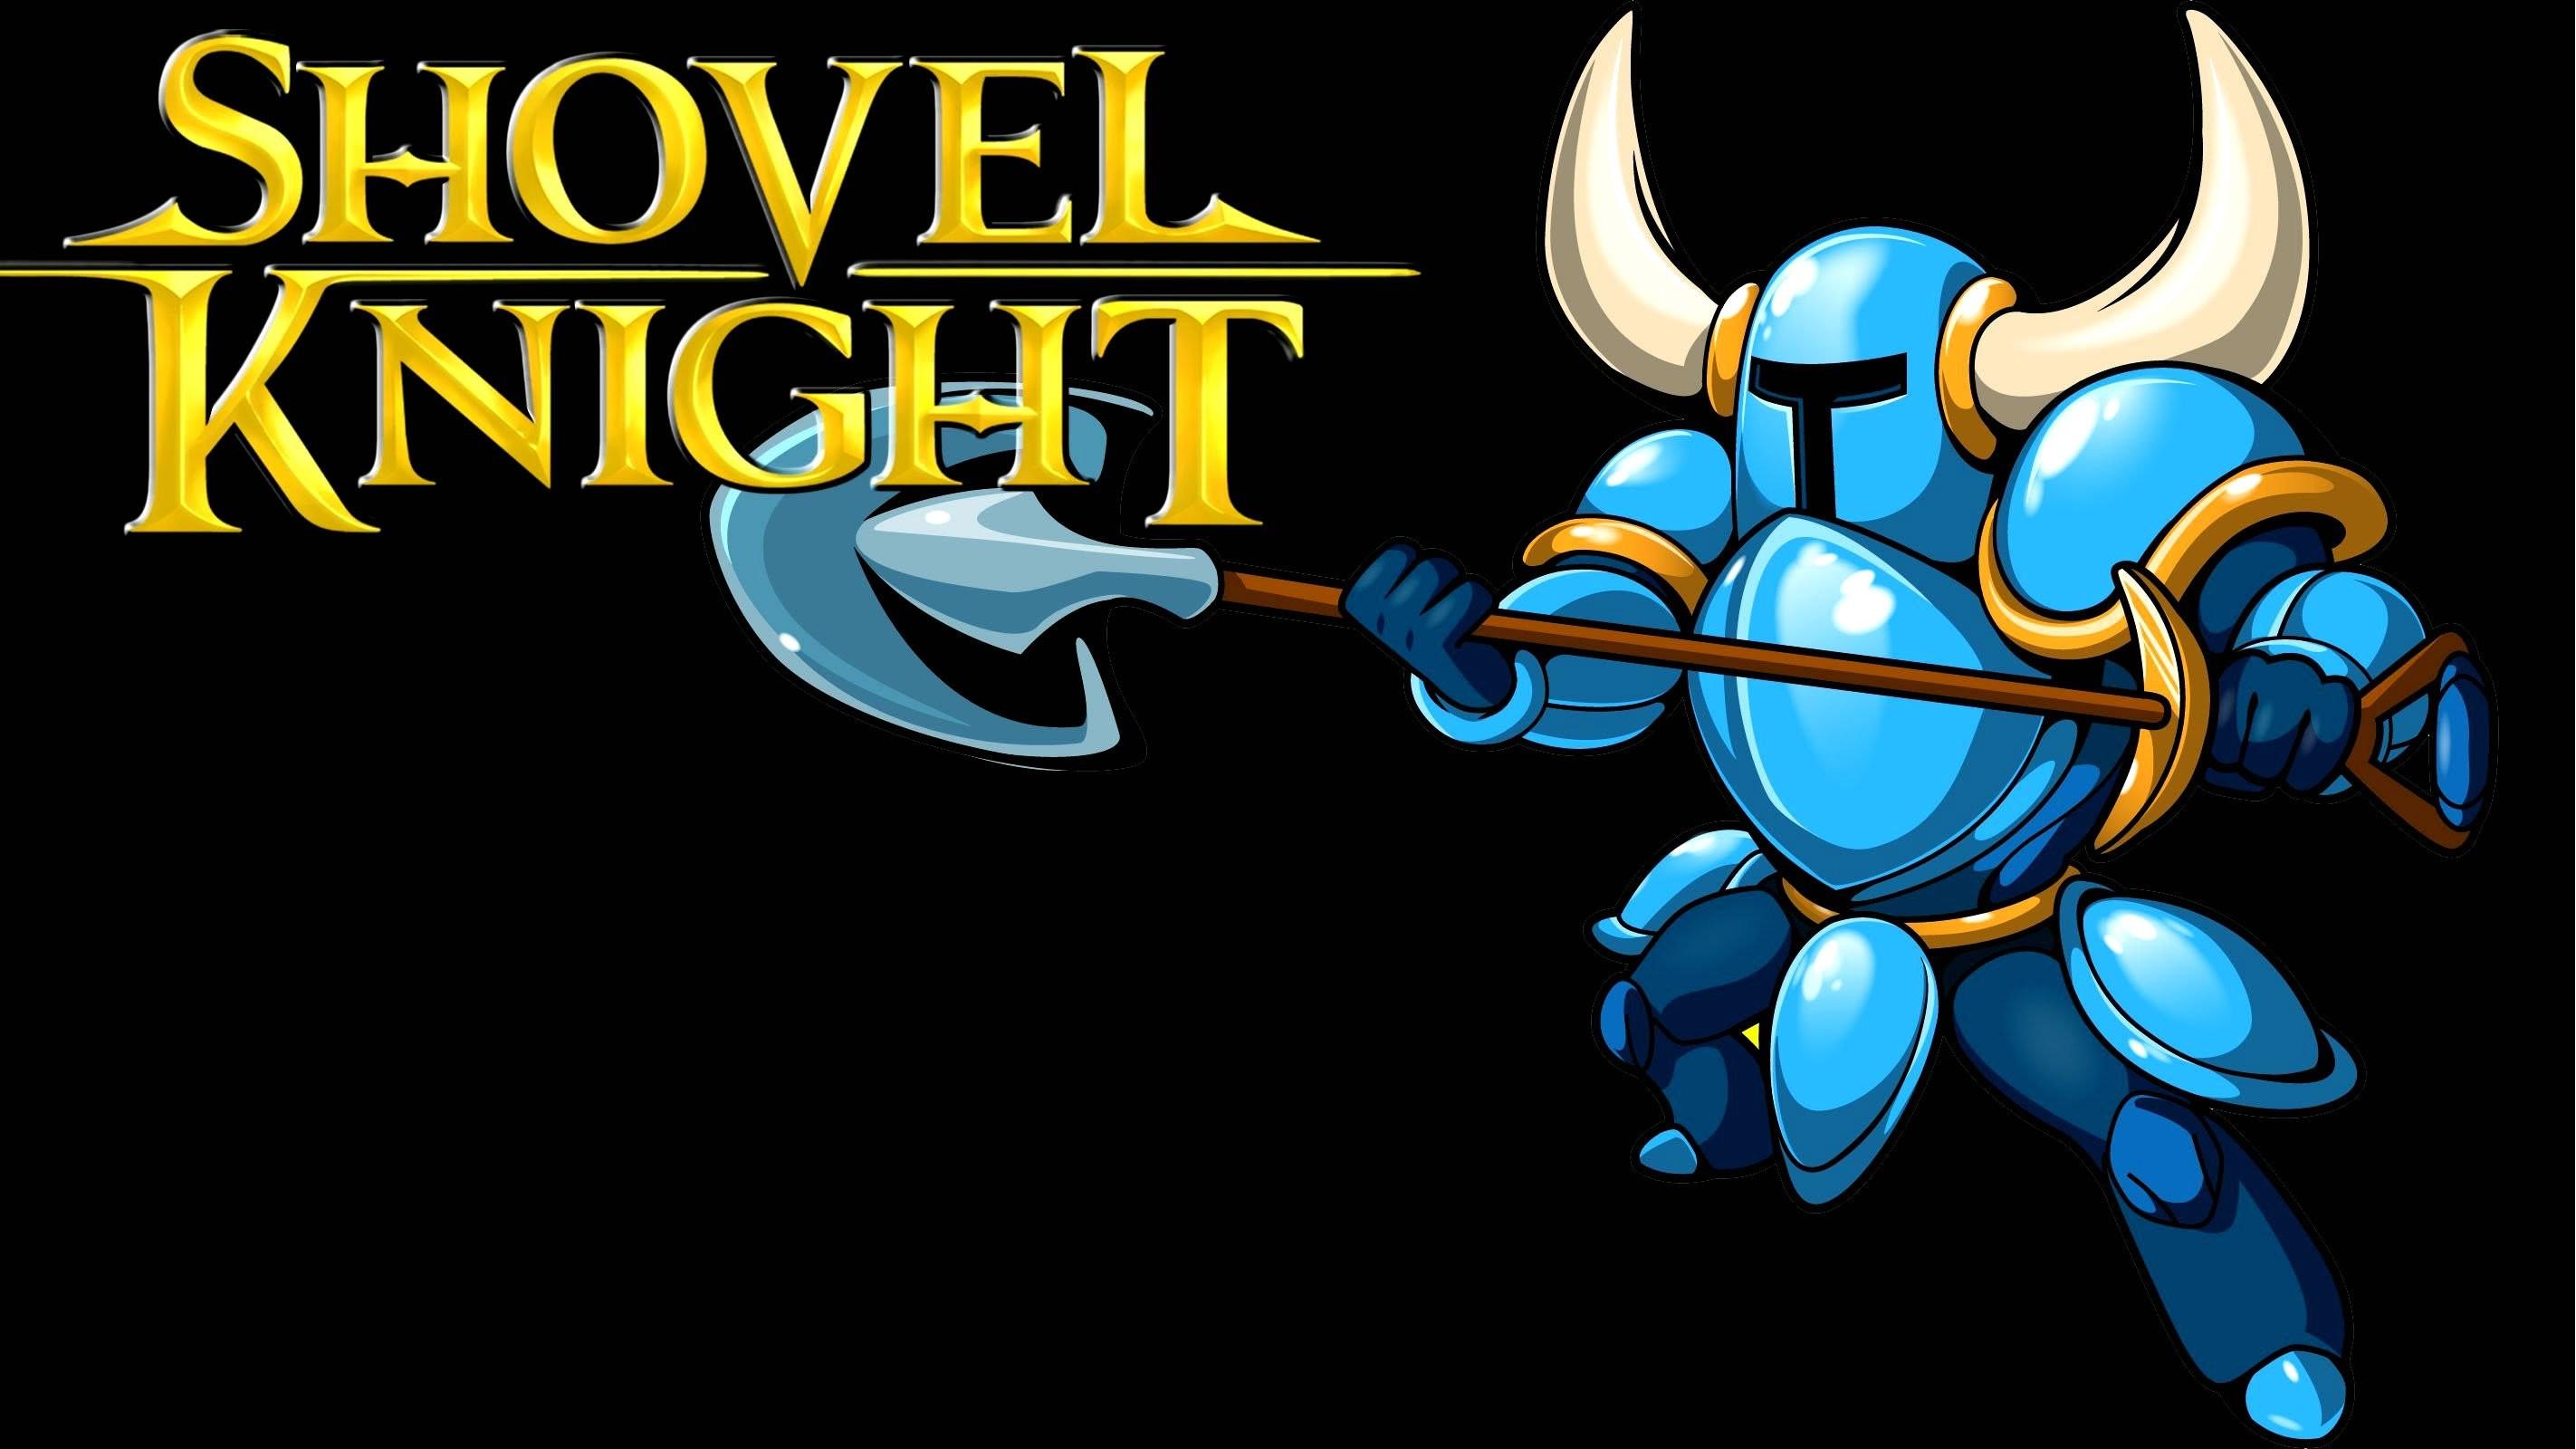 Shovel Knight Wallpaper HD – WallpaperSafari